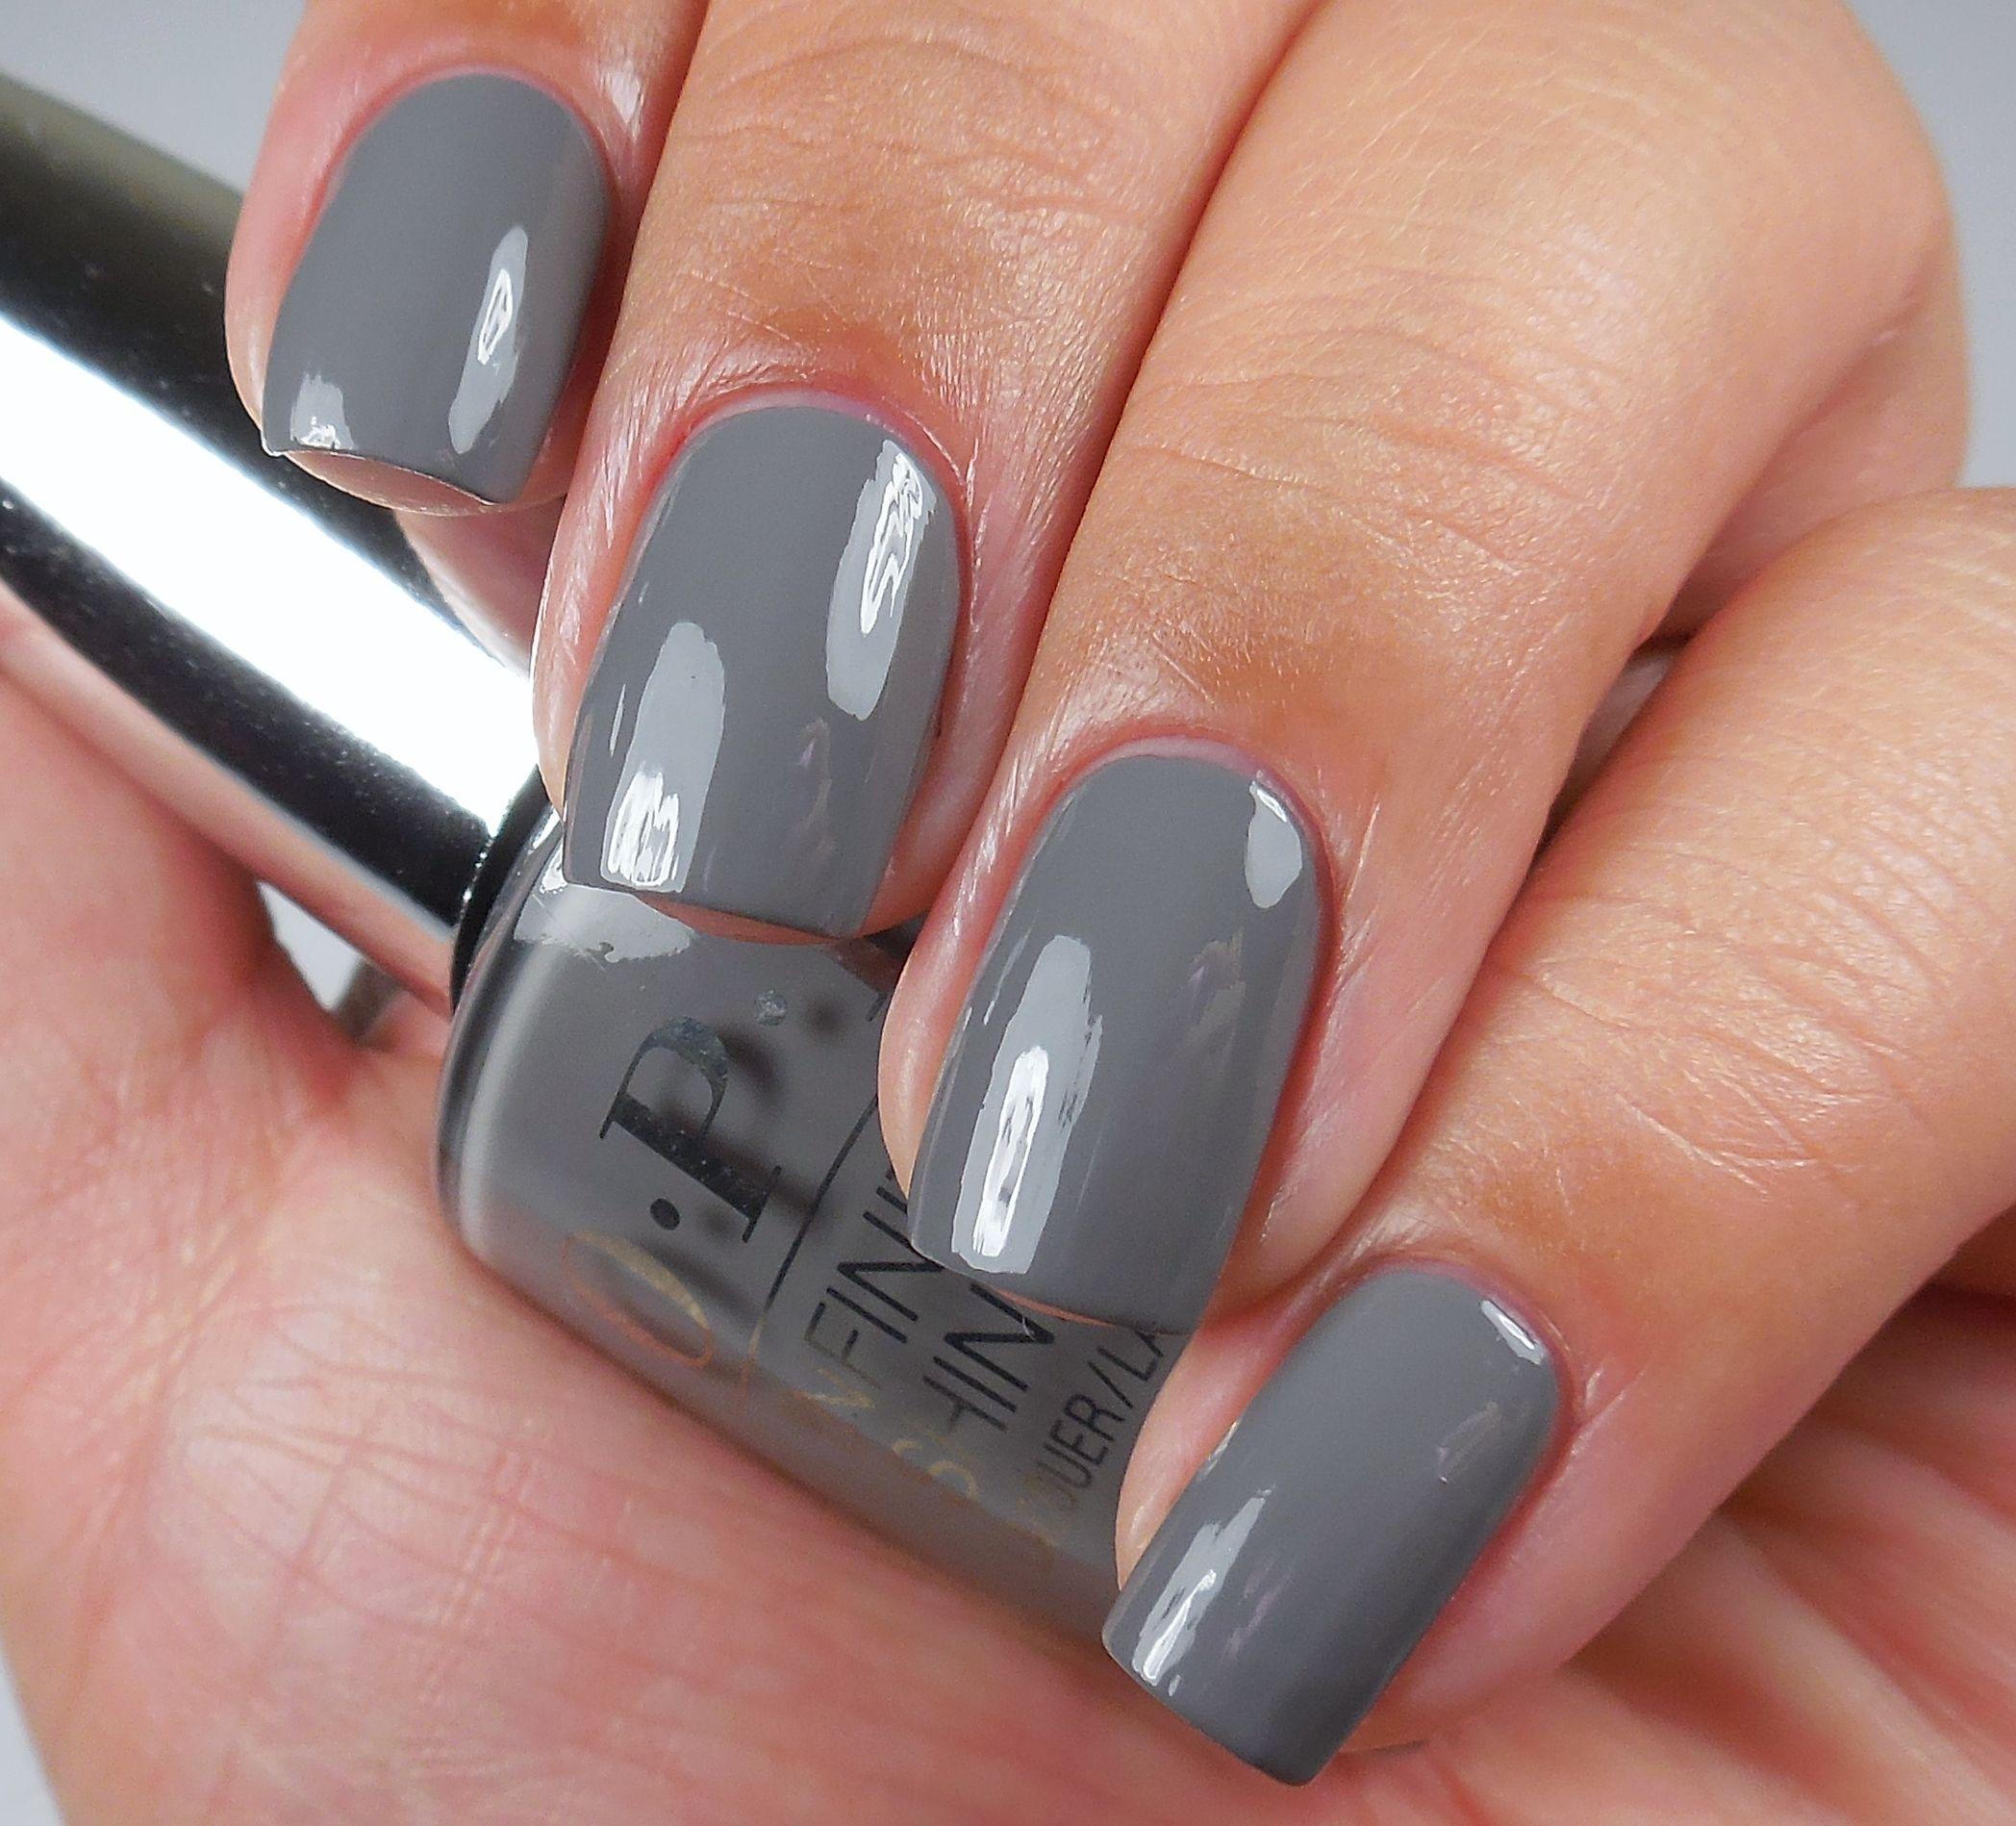 Opi Infinite Shine Steel Waters Run Deep A Long Wearing Grey Creme Nail Polish